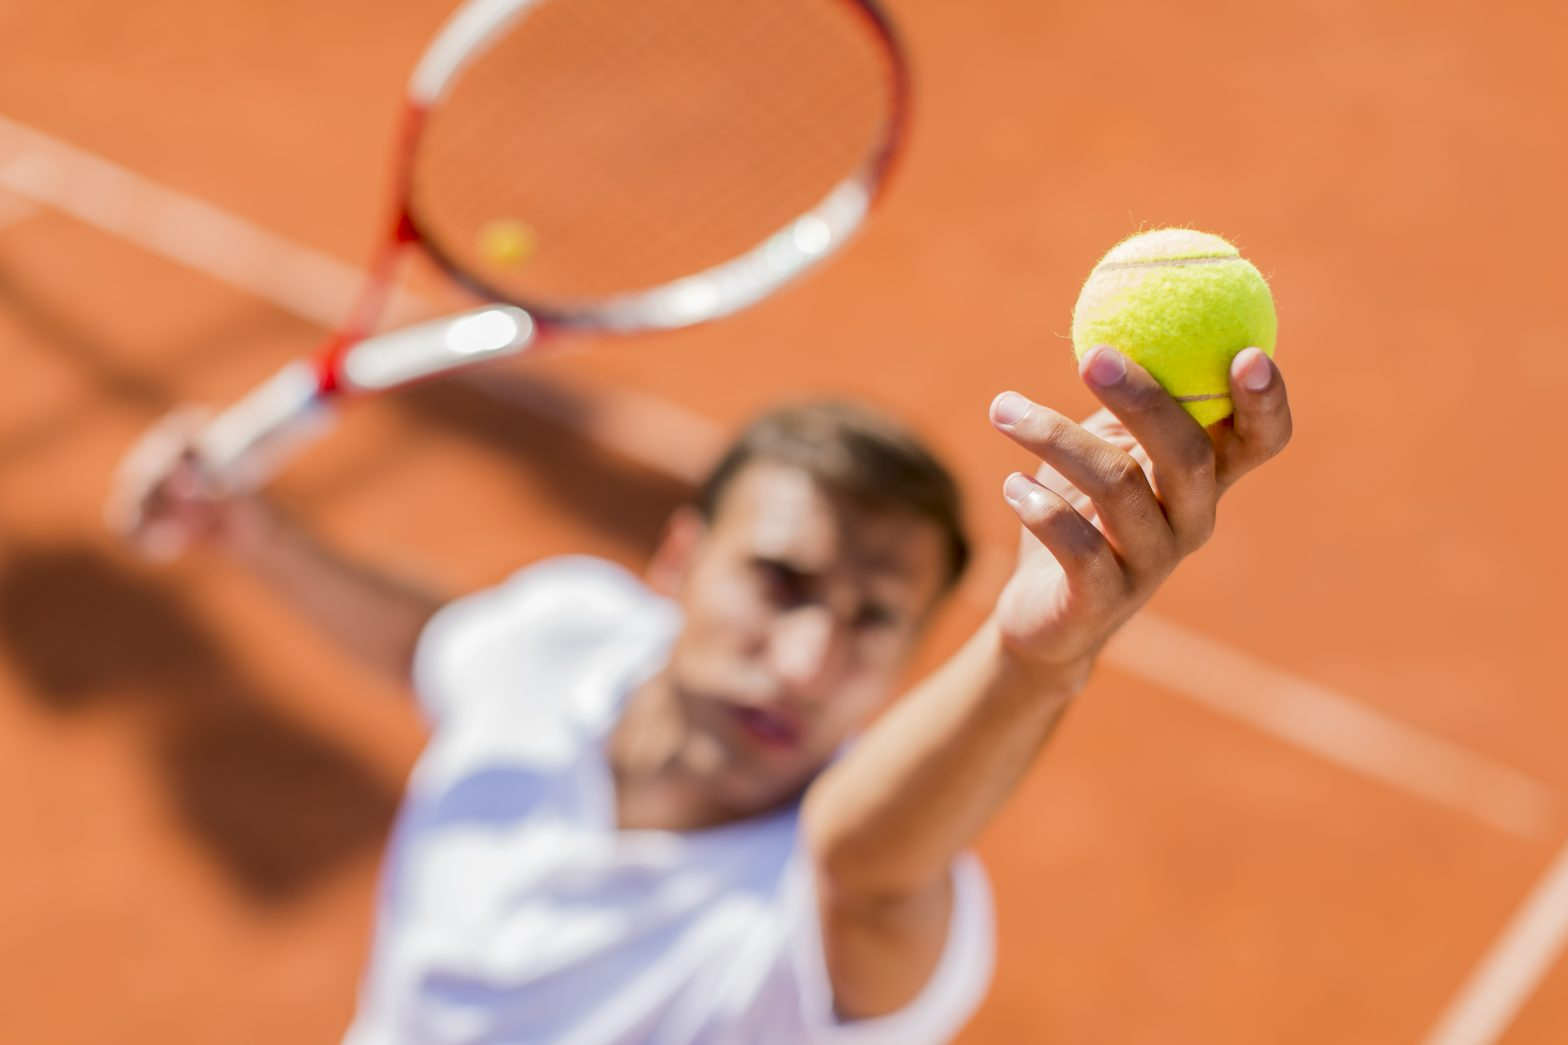 Tennis Rehab Chicago, Beverly, Bridgeport, Glenview, Lincoln Park, Northwest Side Chicago, IL